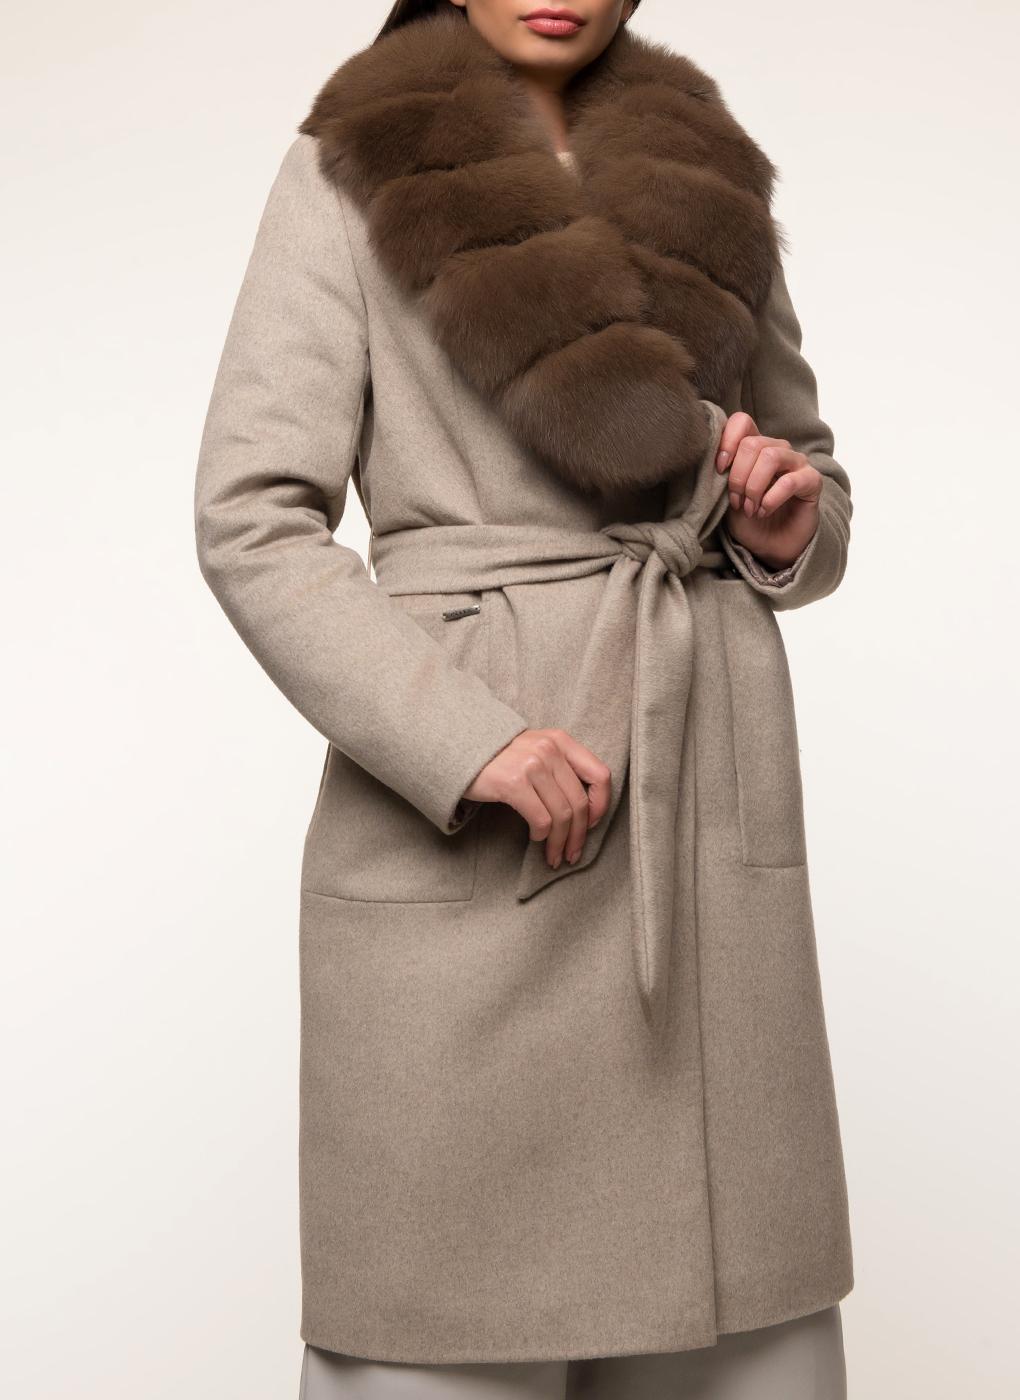 Пальто прямое шерстяное 54, idekka фото